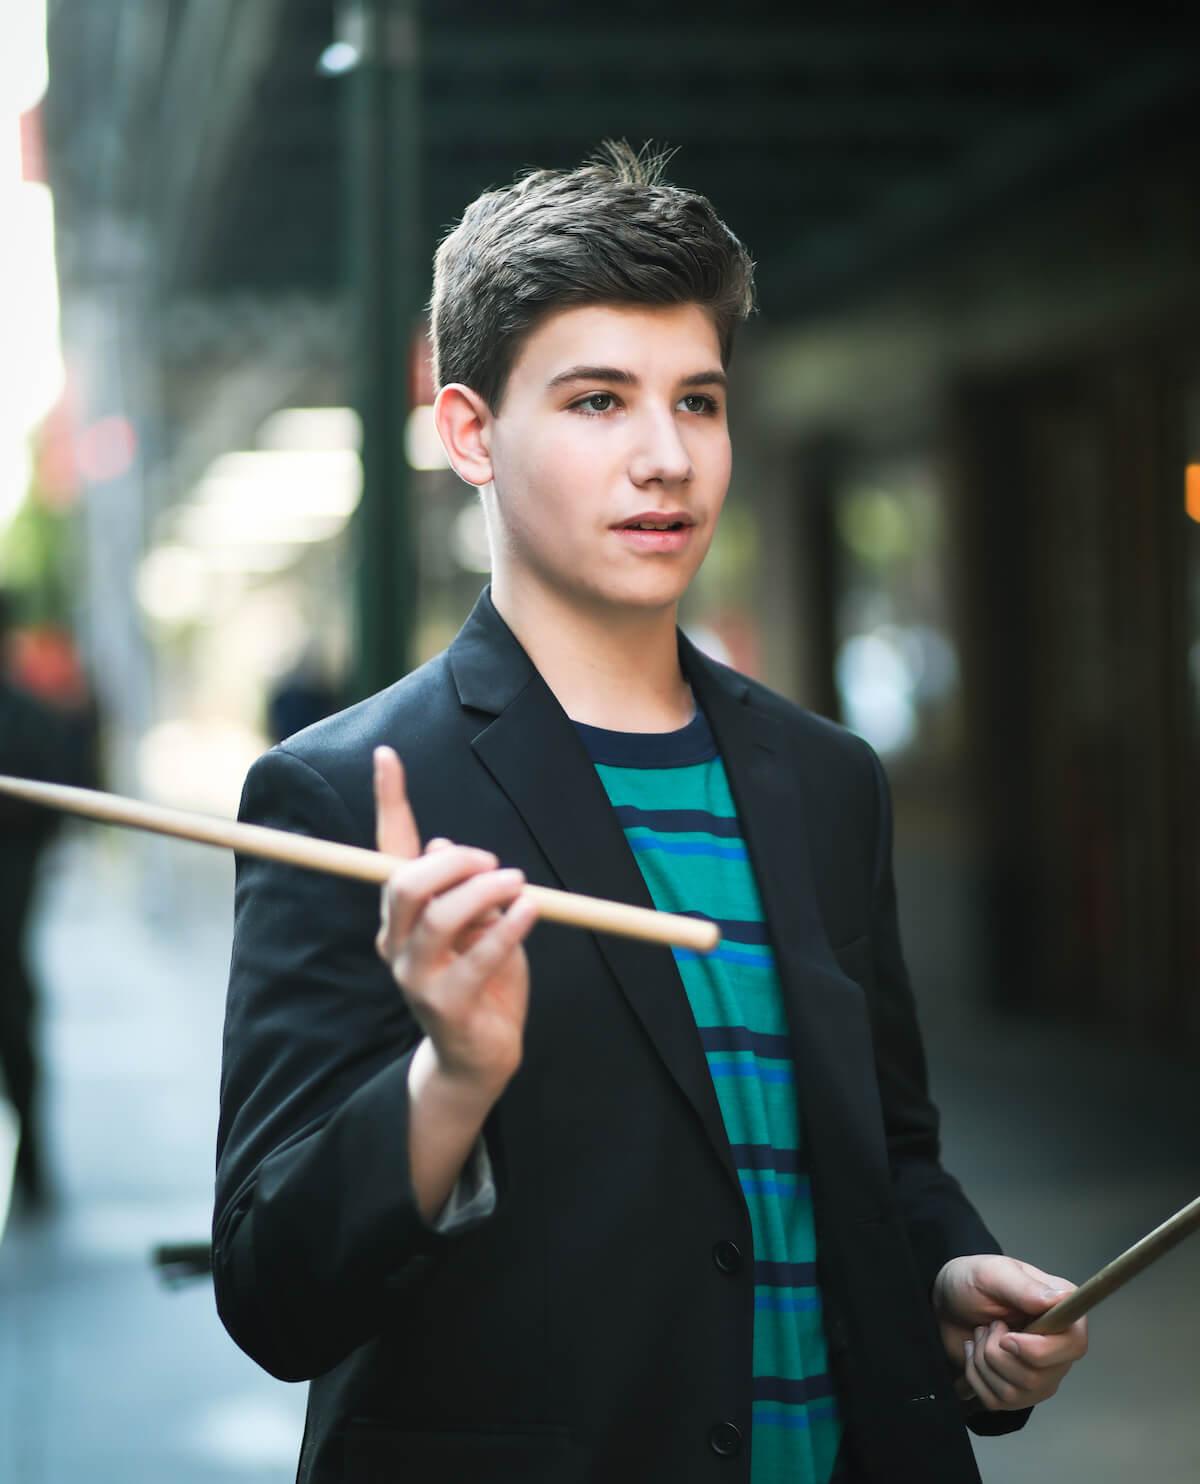 Joshua Turchin with drumsticks